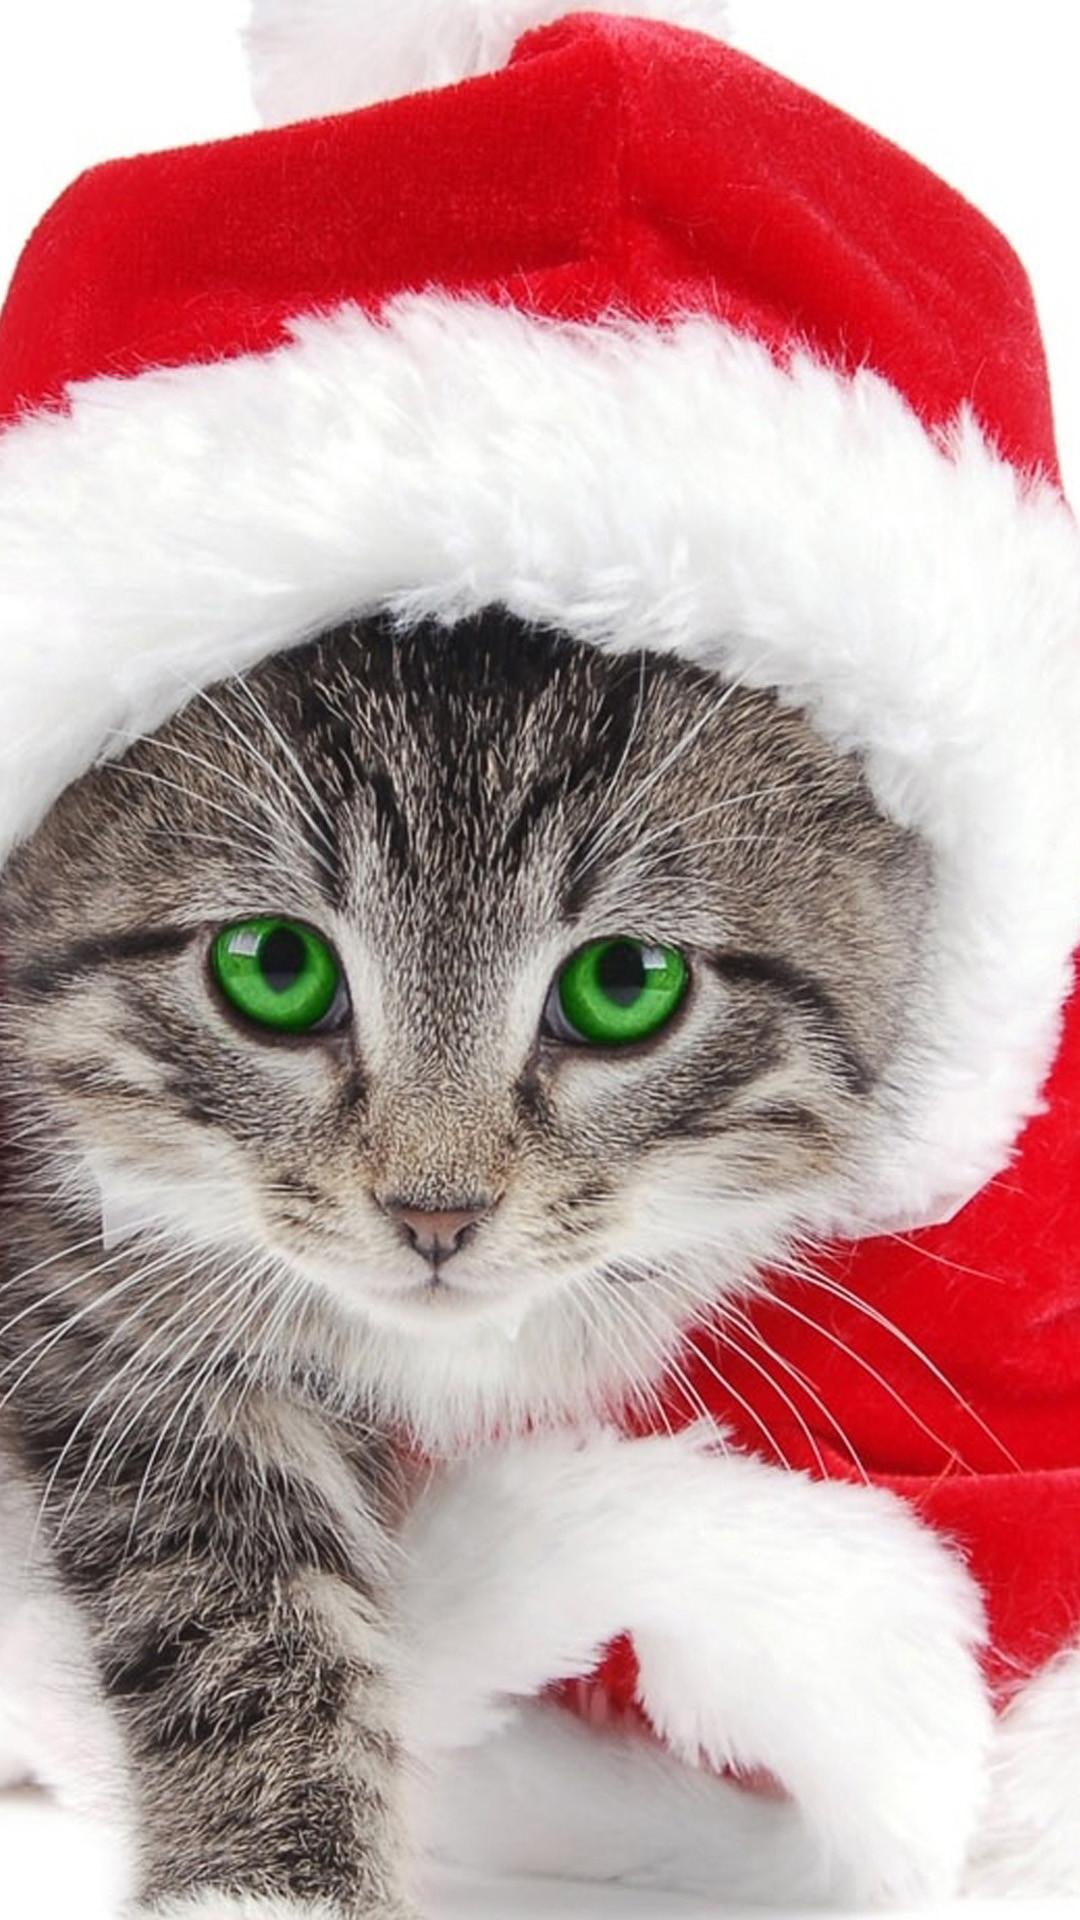 Res: 1080x1920, Samsung Galaxy Wallpaper Christmas | Christmas Cat Samsung Wallpapers, Samsung  Galaxy S5, Galaxy S4